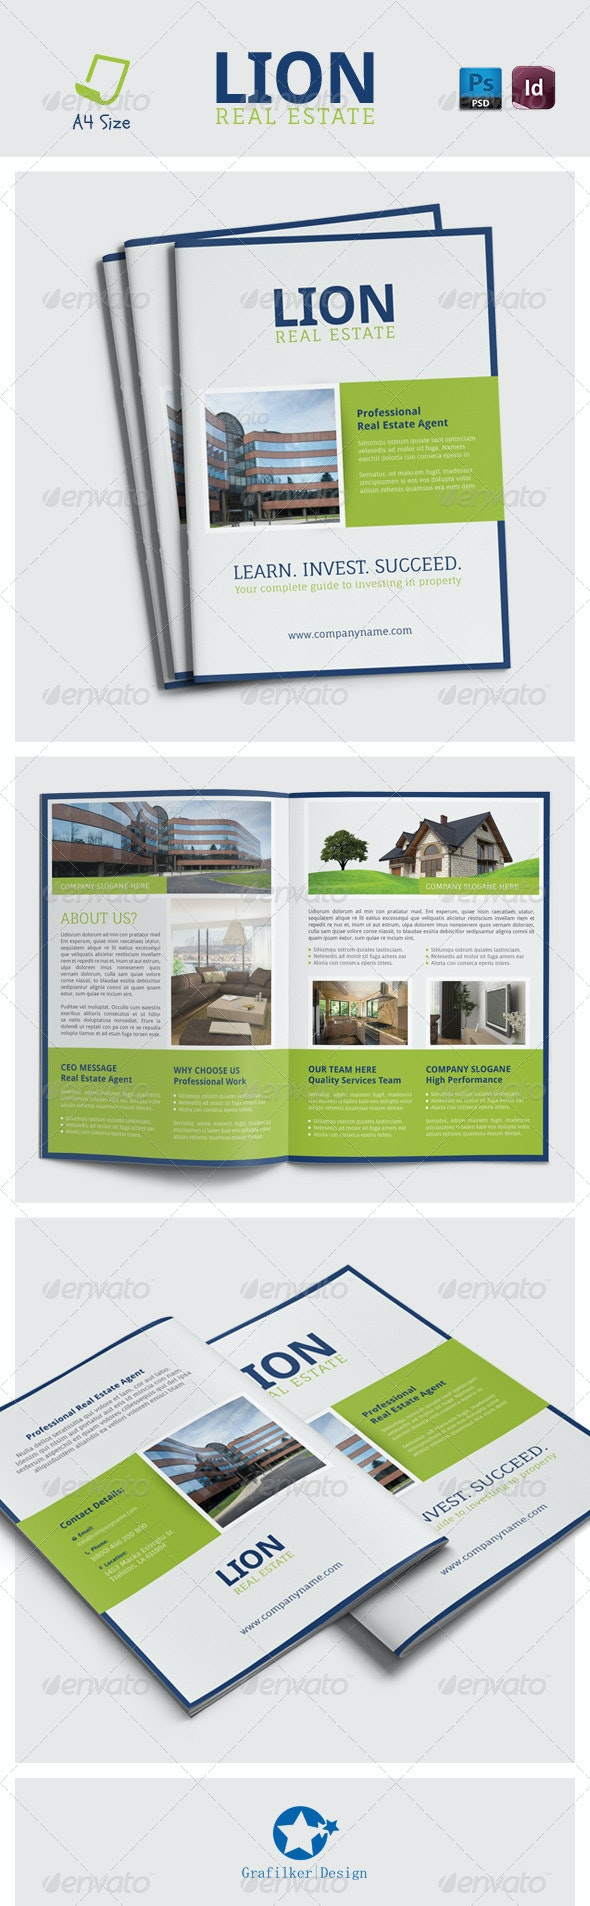 Real Estate Brochure Templates by grafilker   GraphicRiver